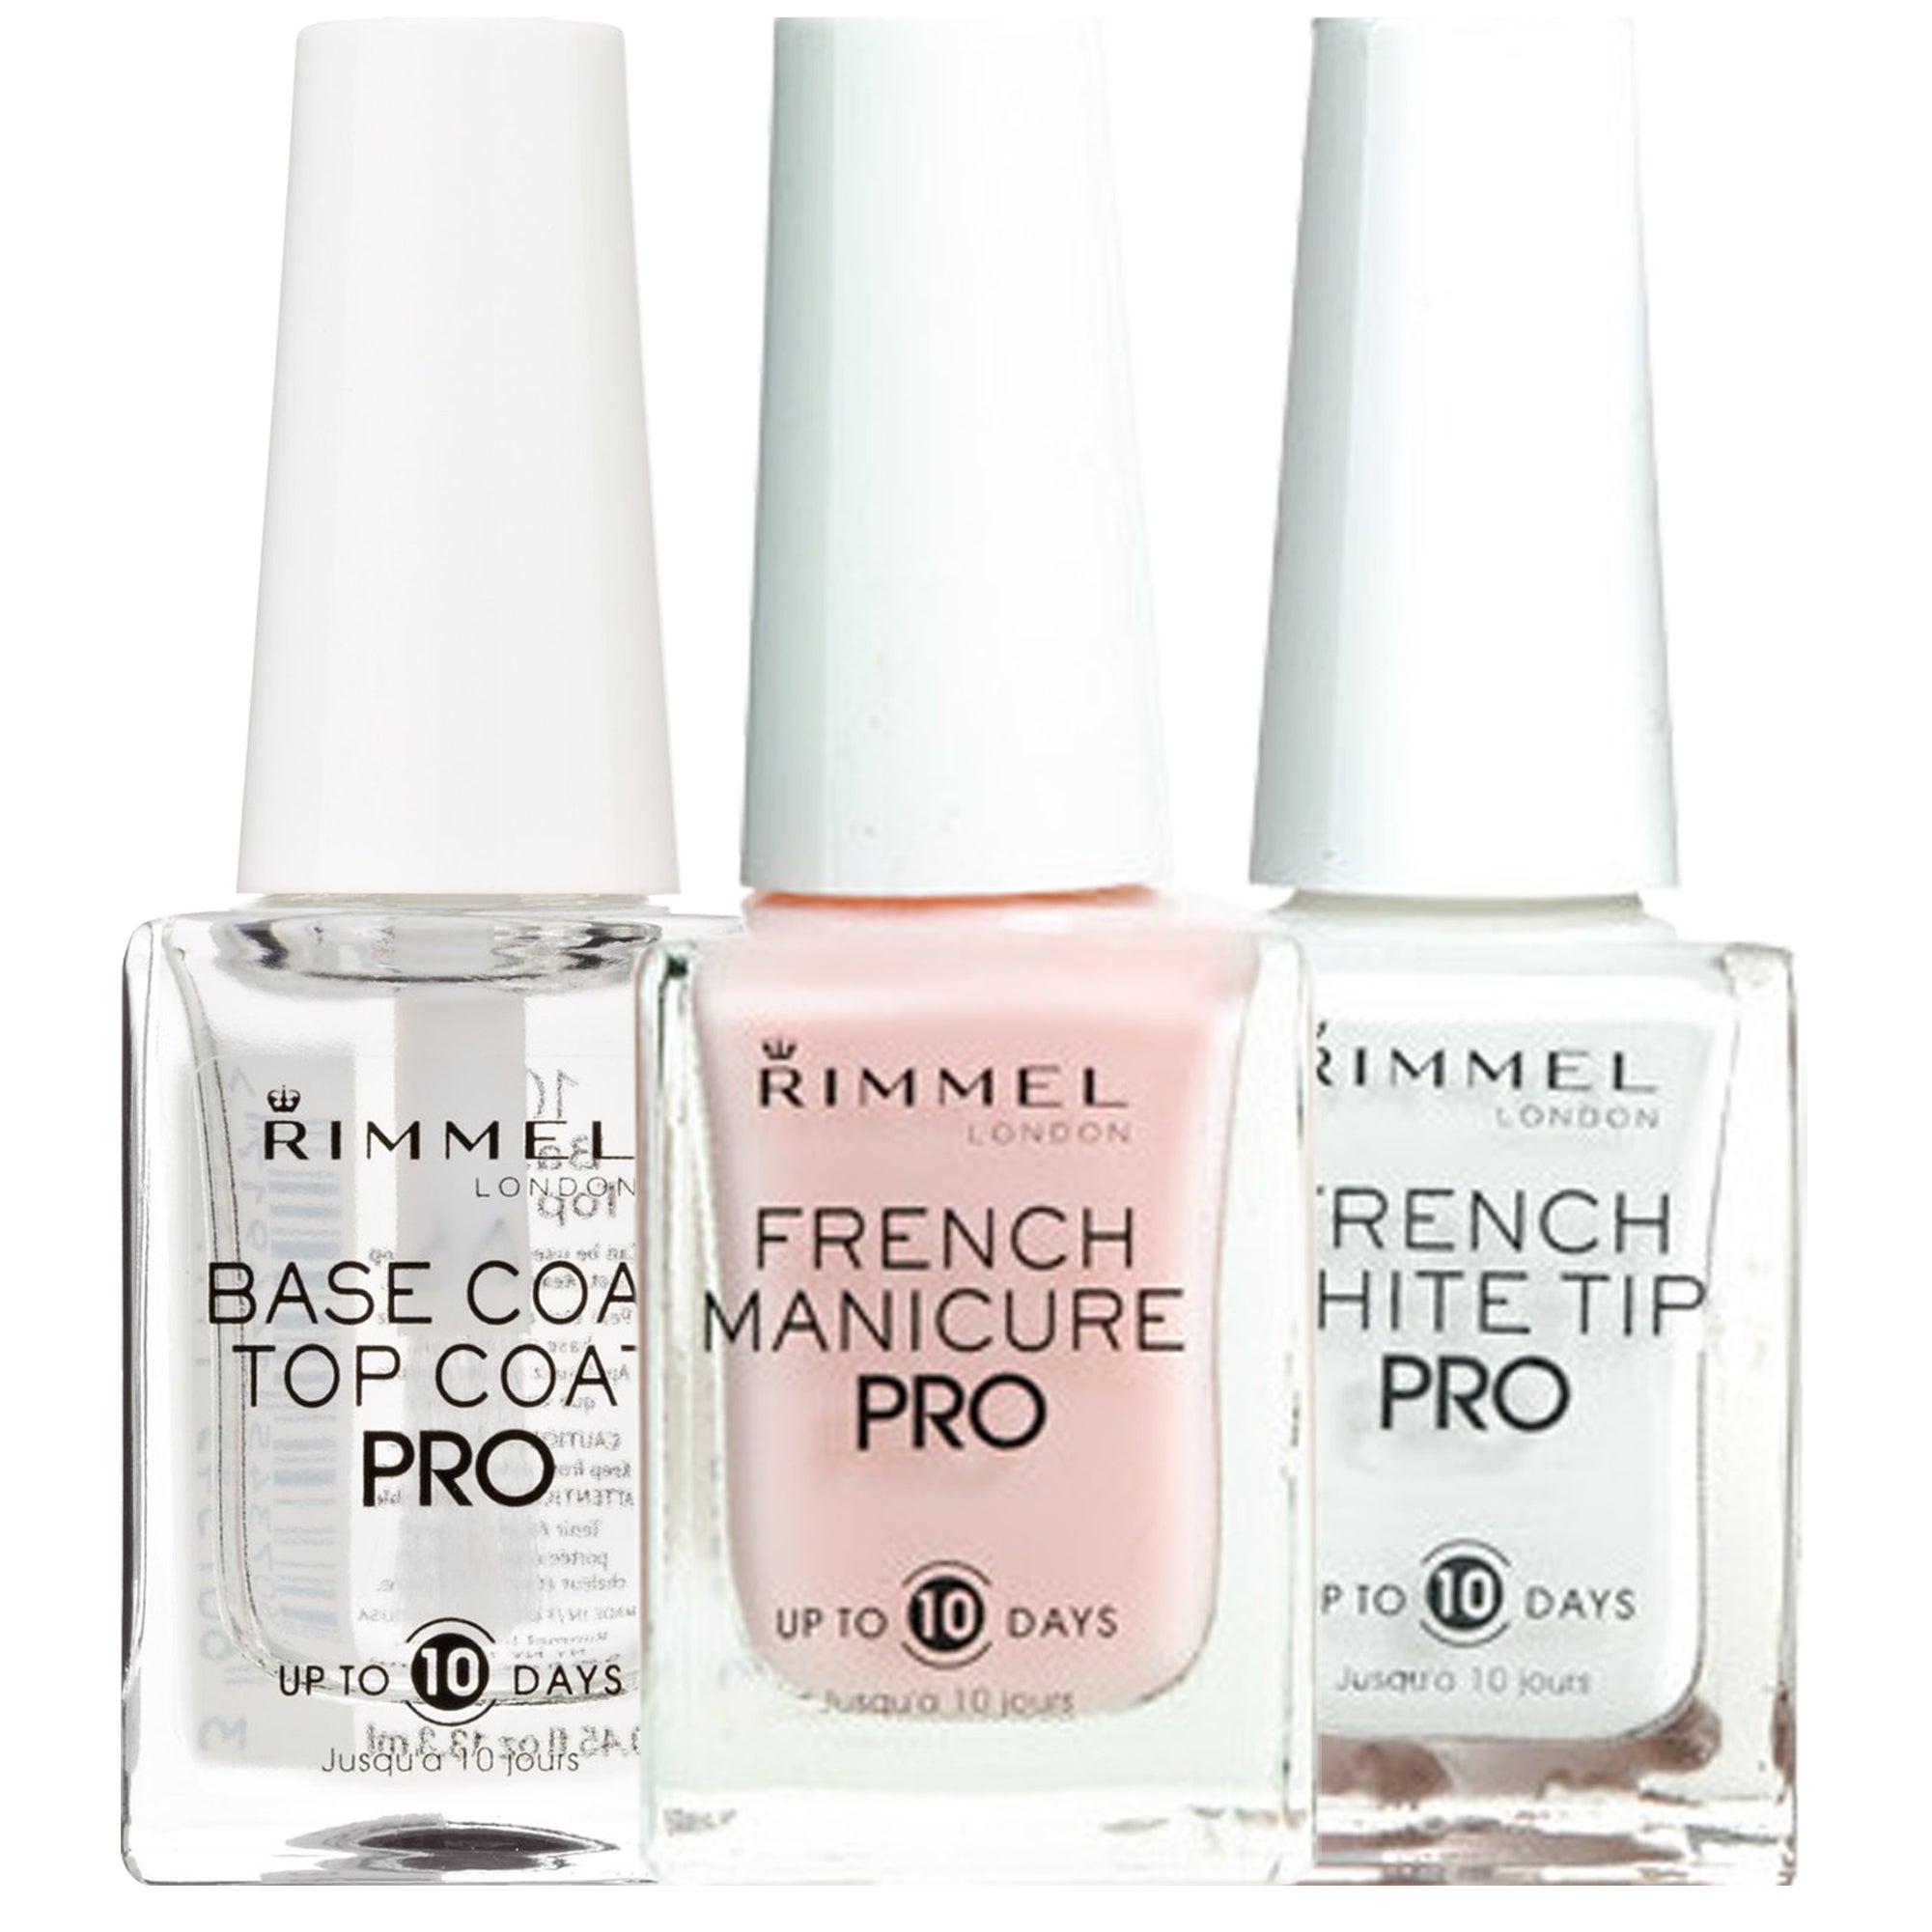 Shop Rimmel Lasting Finish Pro Nail Enamel French Manicure 3 Piece